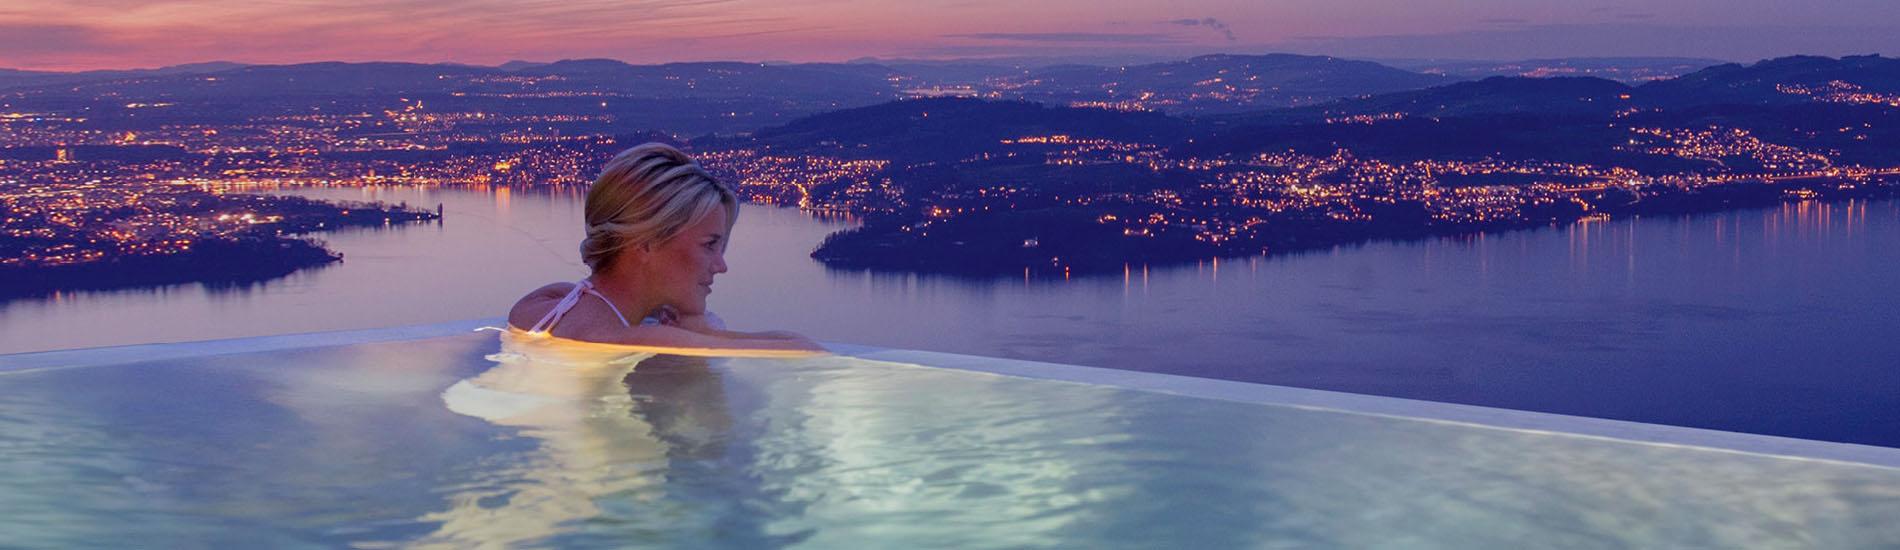 Bürgenstock Resort & Spa